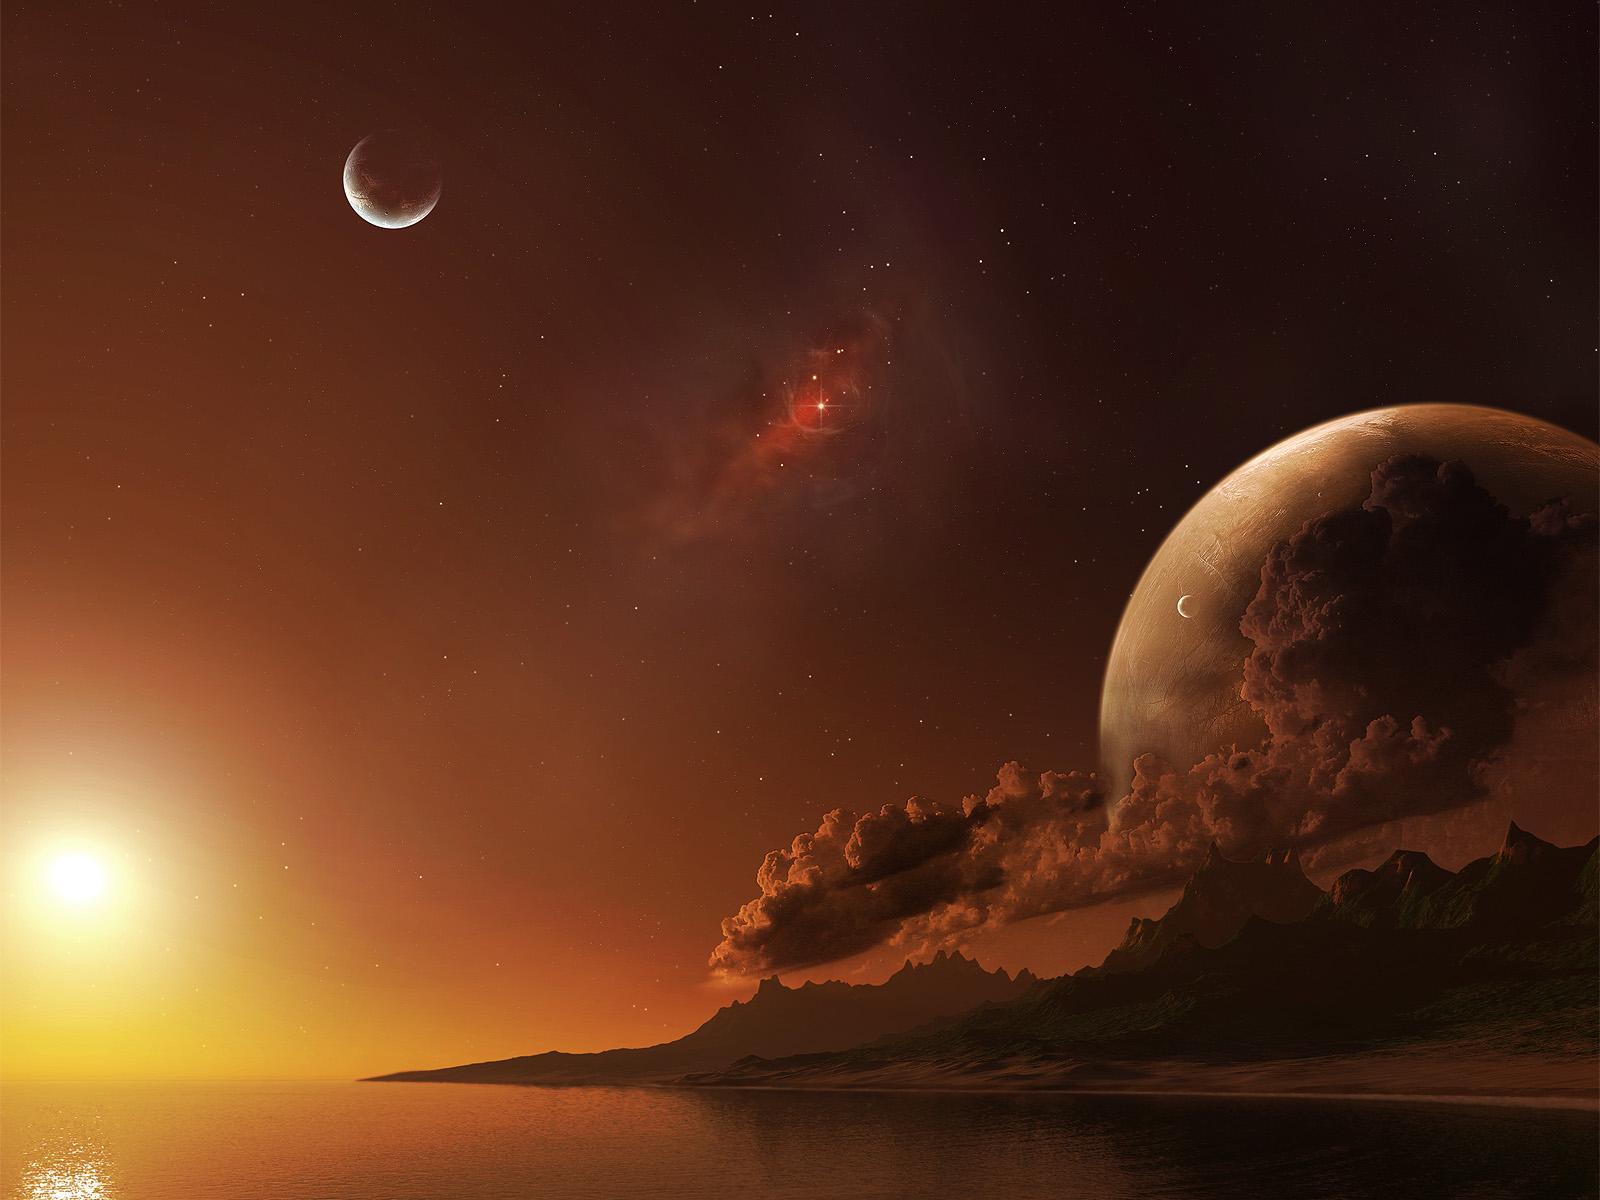 alien sunset wallpaper - photo #14